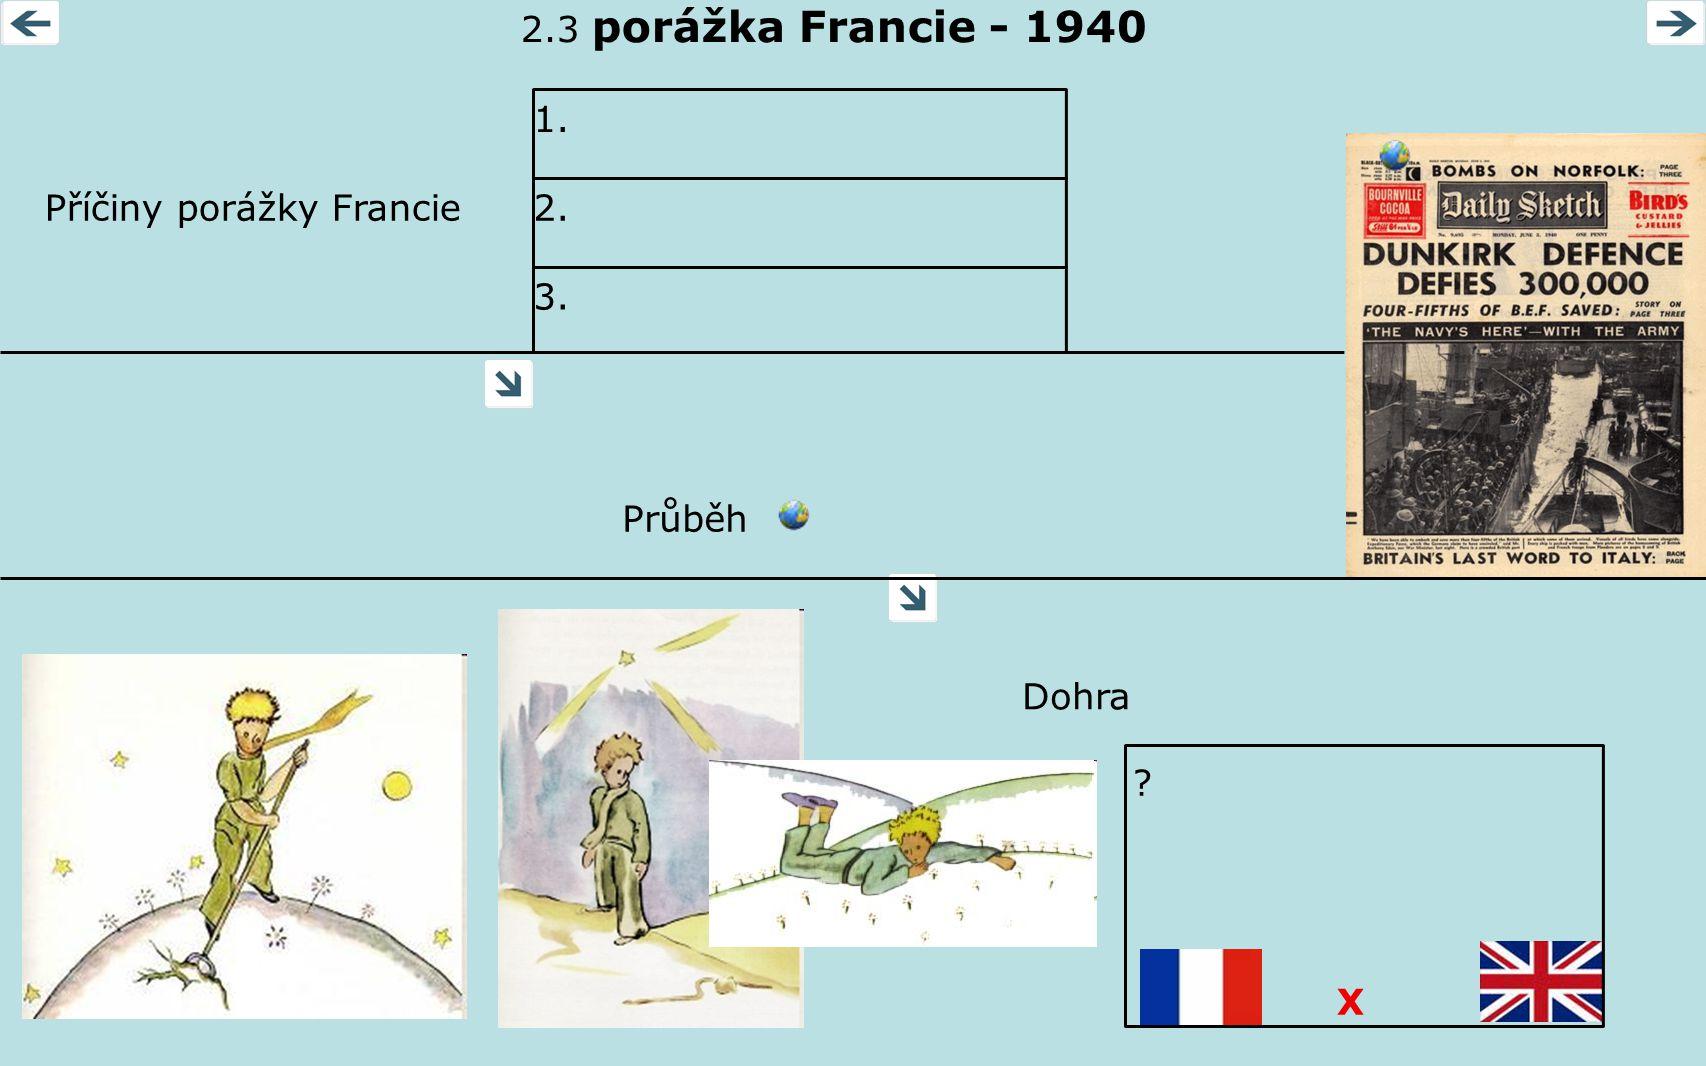 2.3 porážka Francie - 1940 1. Příčiny porážky Francie 2. 3. Průběh Dohra X